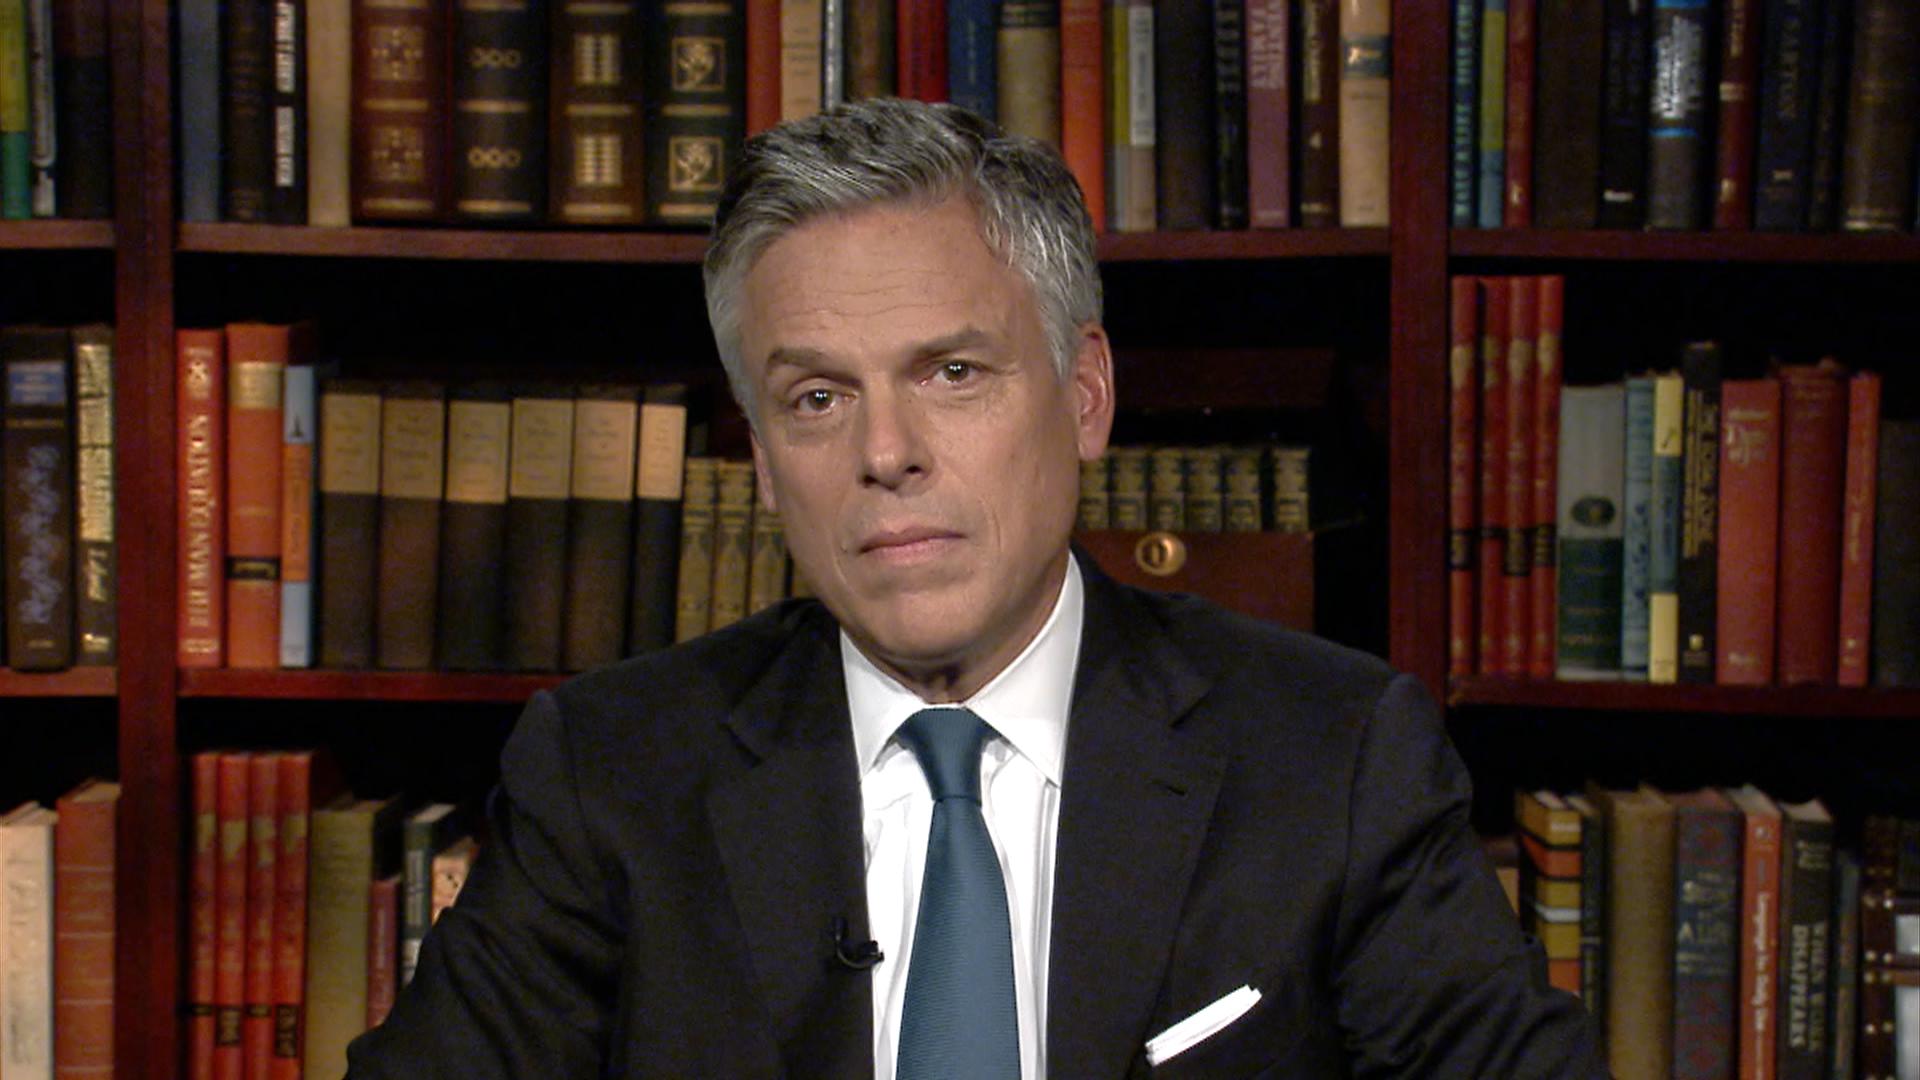 Huntsman: 'We have to resort to diplomacy'